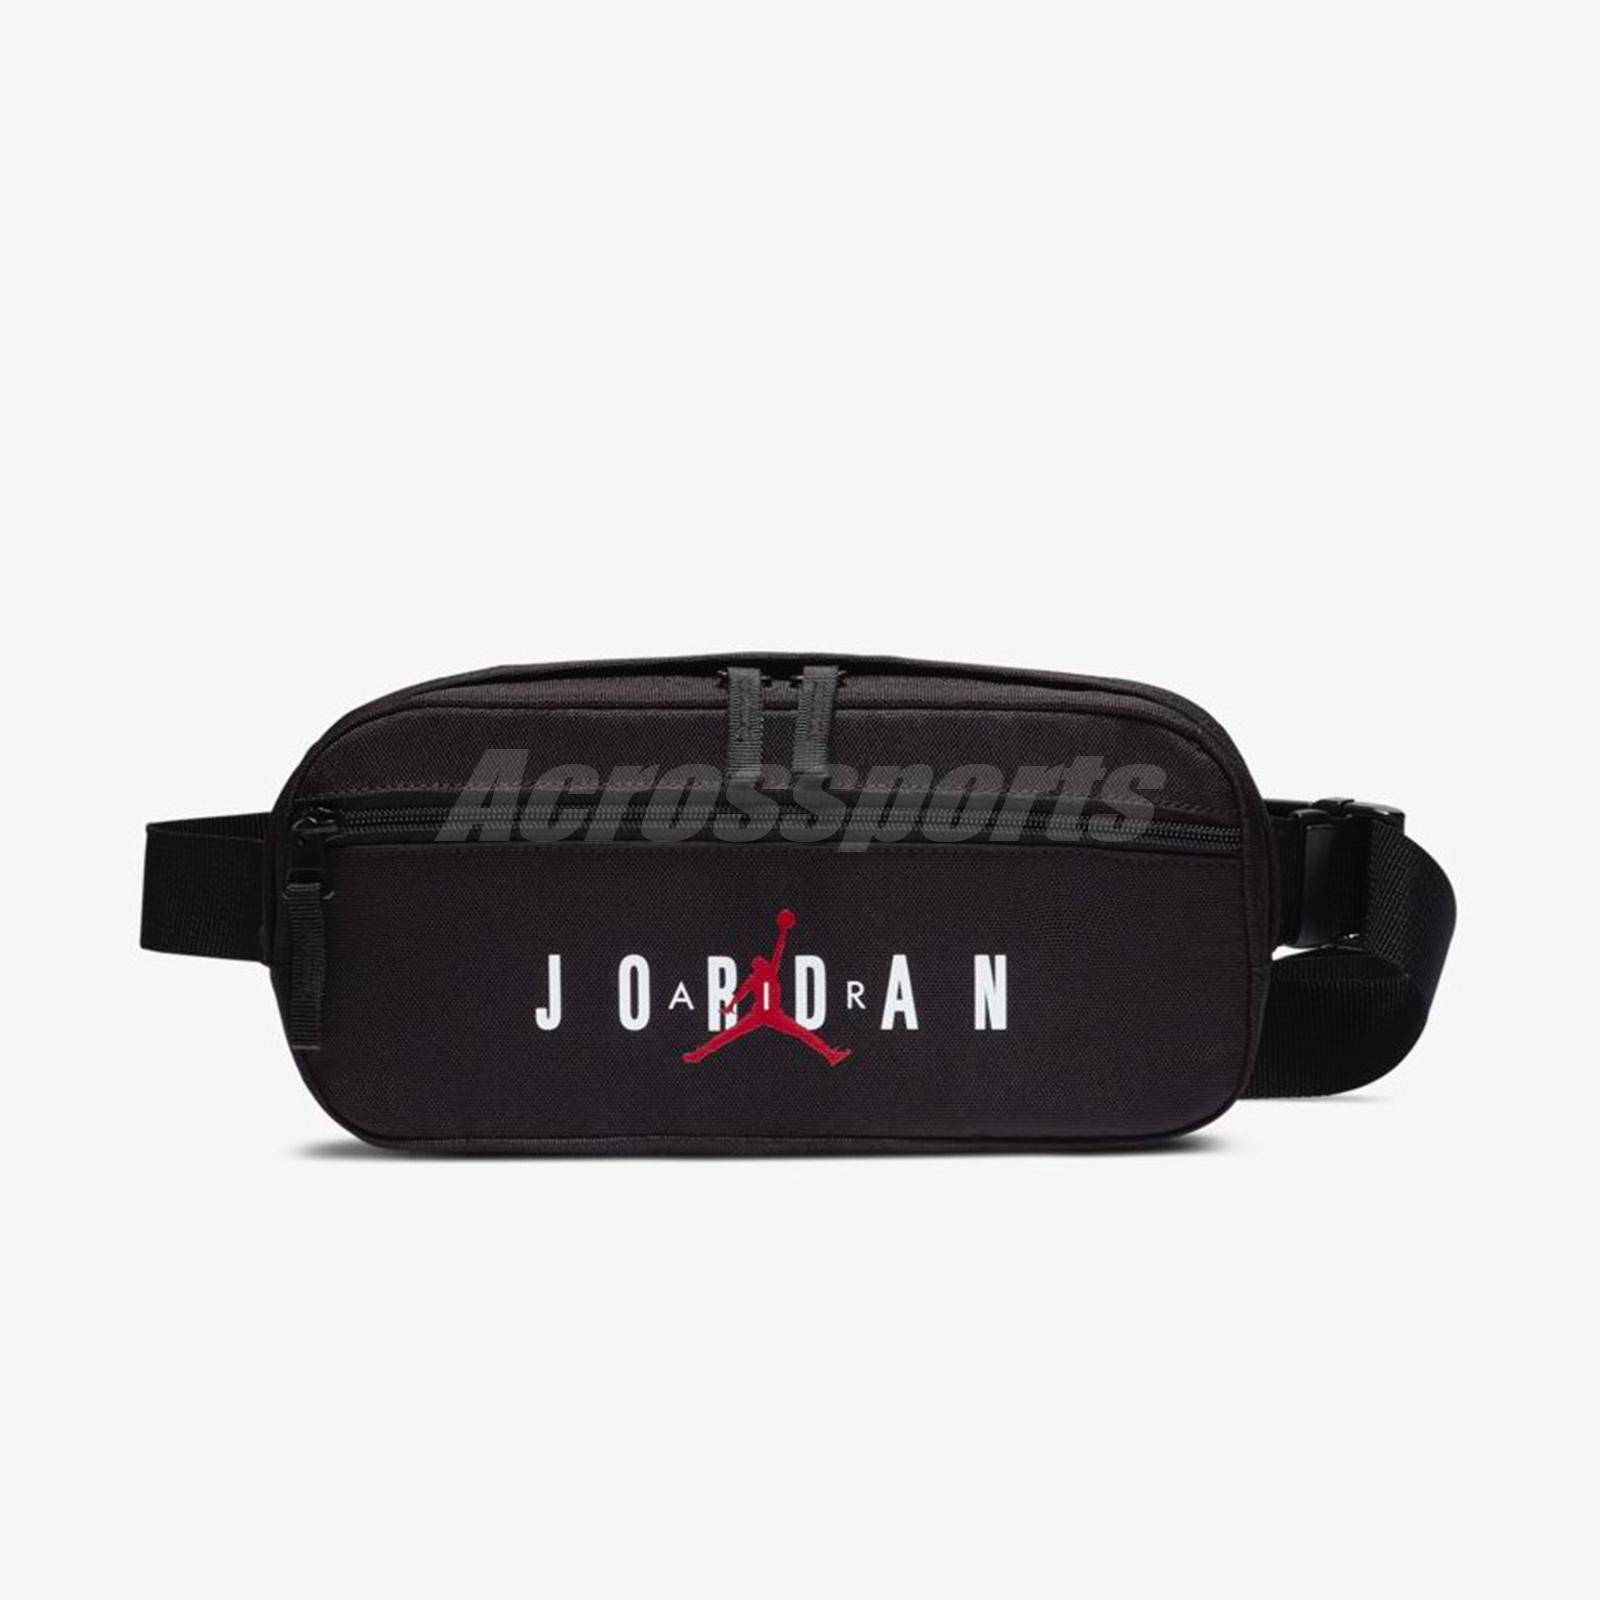 3f325f345a4 Nike Air Jordan 6 VI Infrared Black Red Crossbody Fanny Waist Bag 9A0230-023